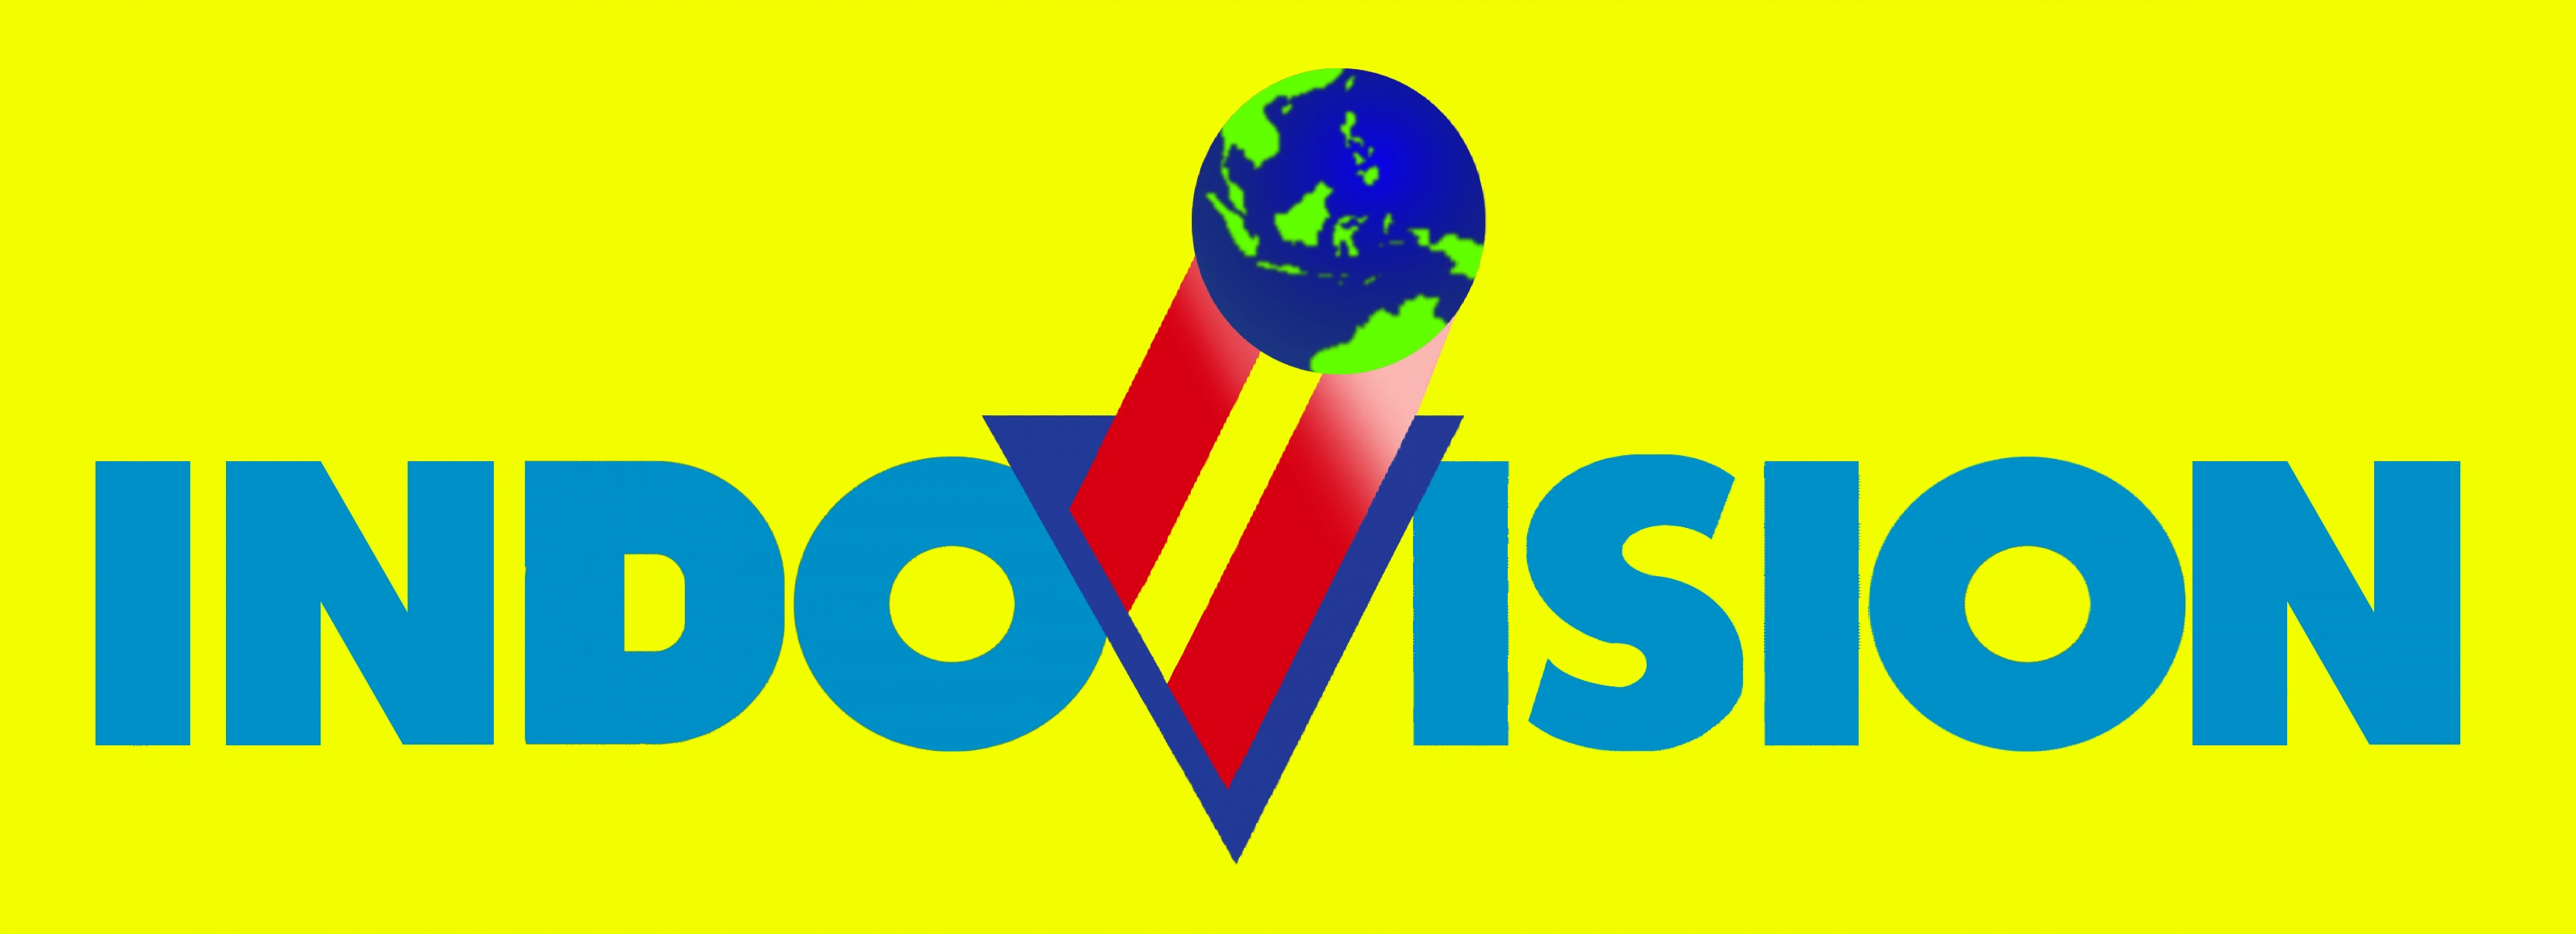 Indovision 1995